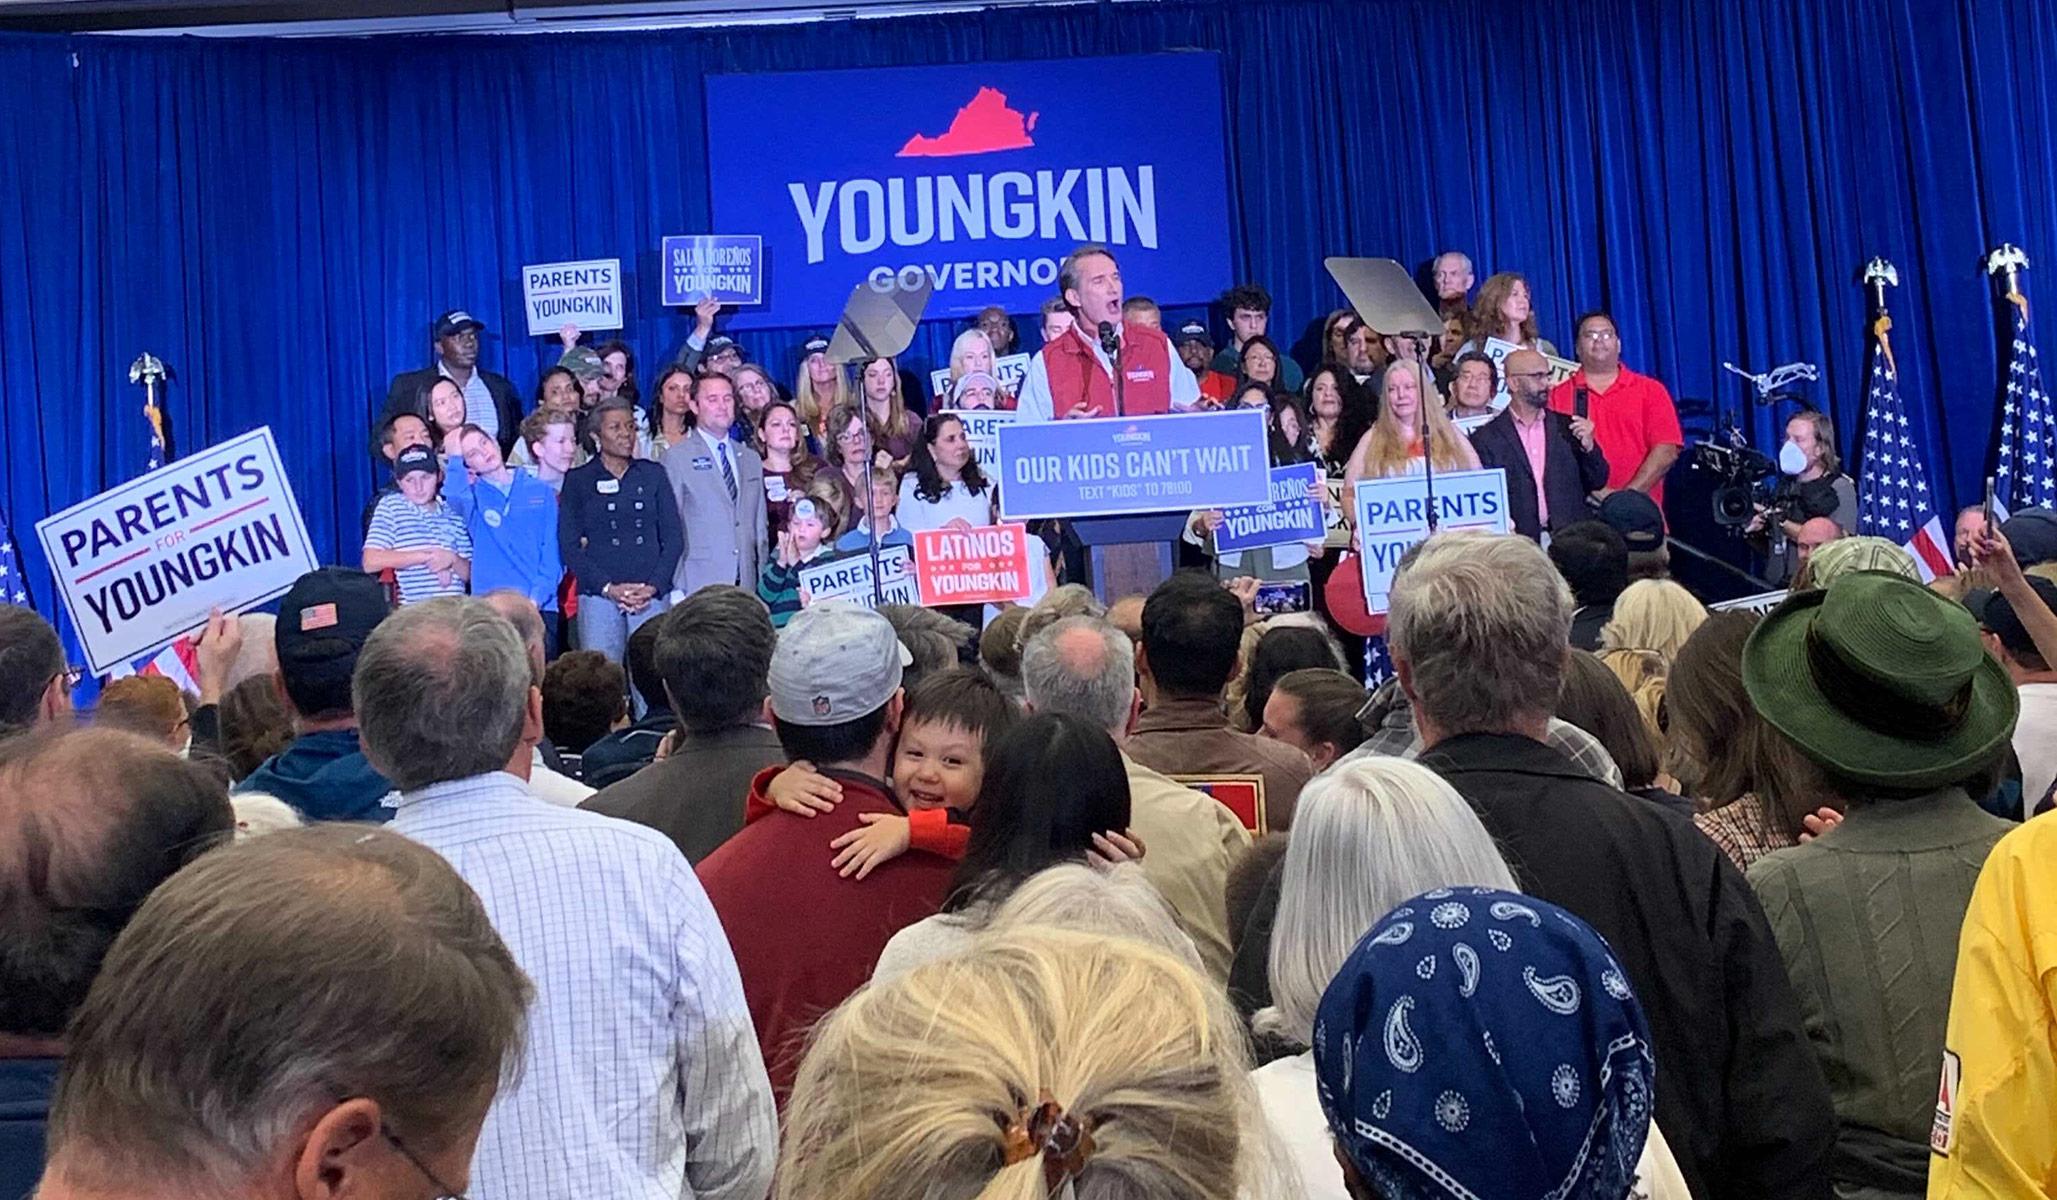 Glenn Youngkin Ledakan Penutupan Loudoun County